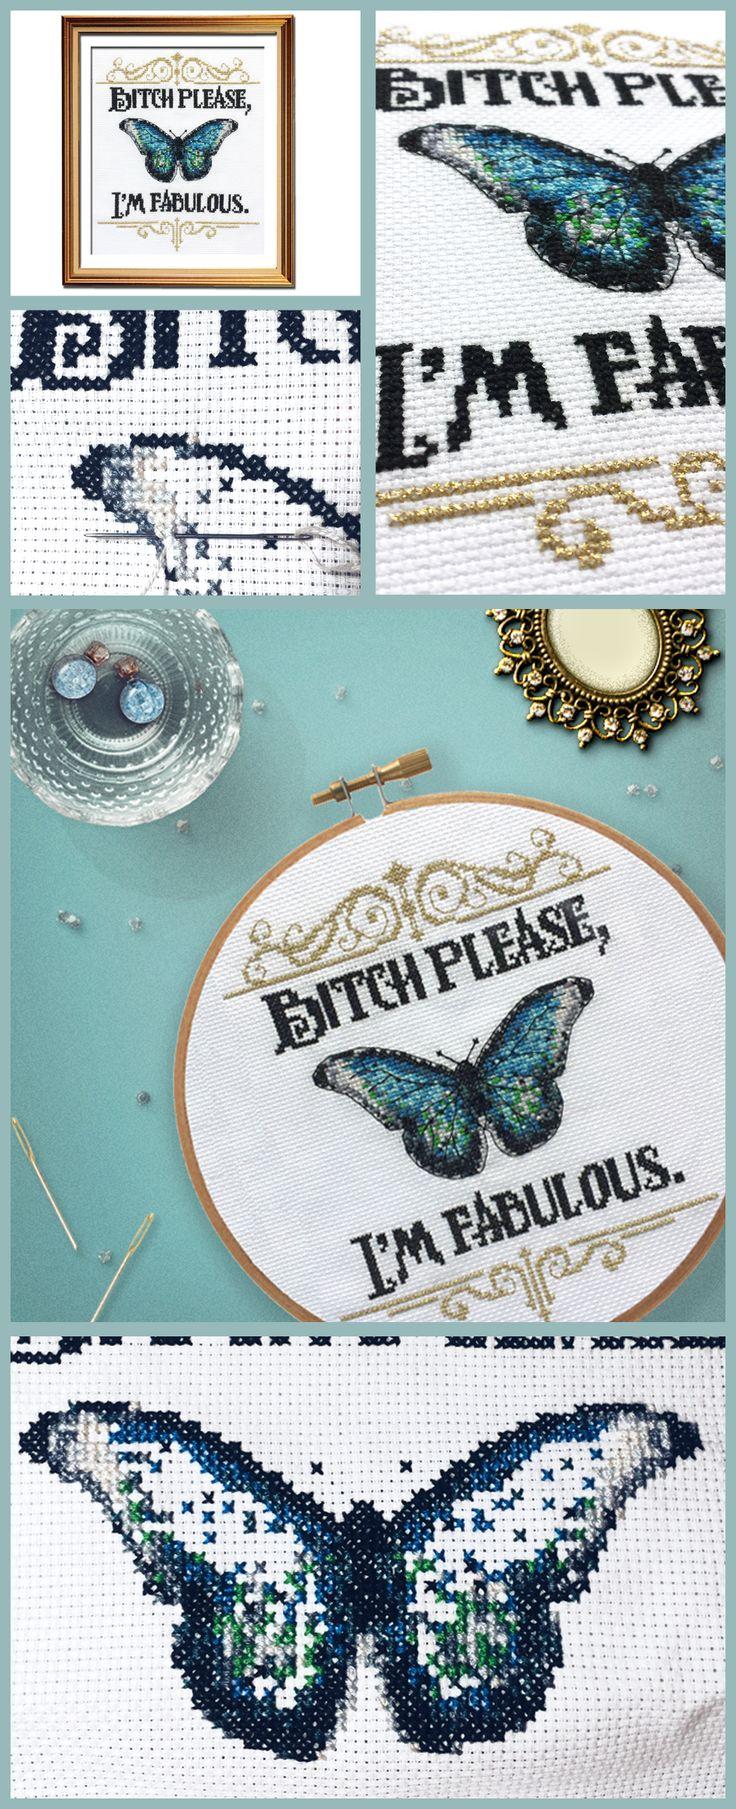 Prettiest funny cross stitch pattern ever